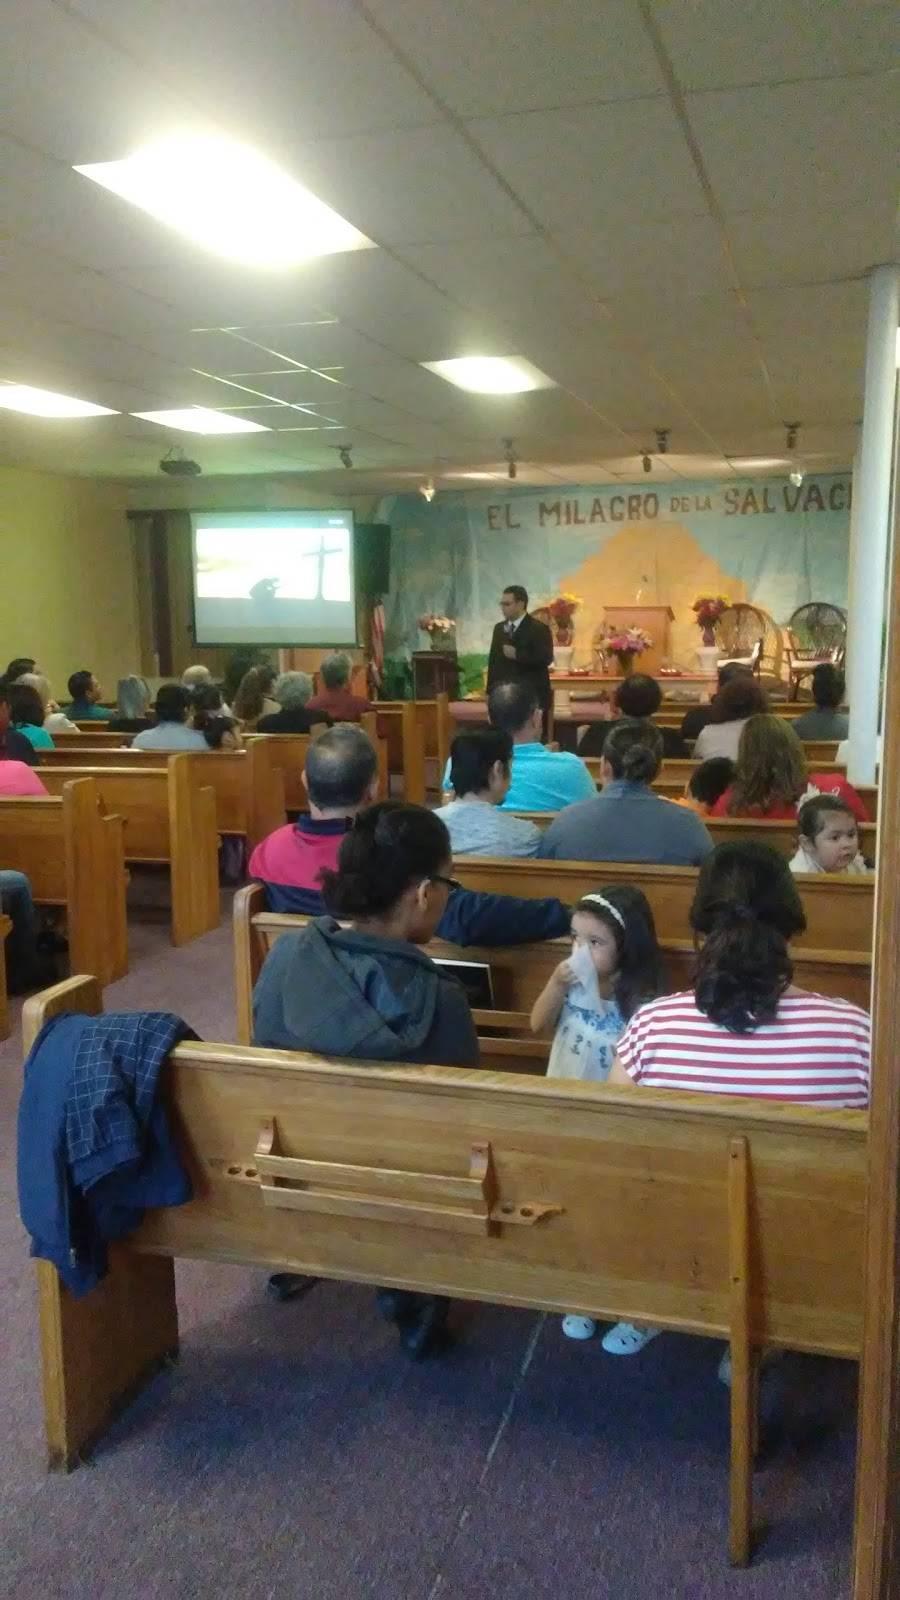 Detroit Cavalry Spanish SDA Church - church  | Photo 10 of 10 | Address: 1227 Cavalry St, Detroit, MI 48209, USA | Phone: (313) 842-2730